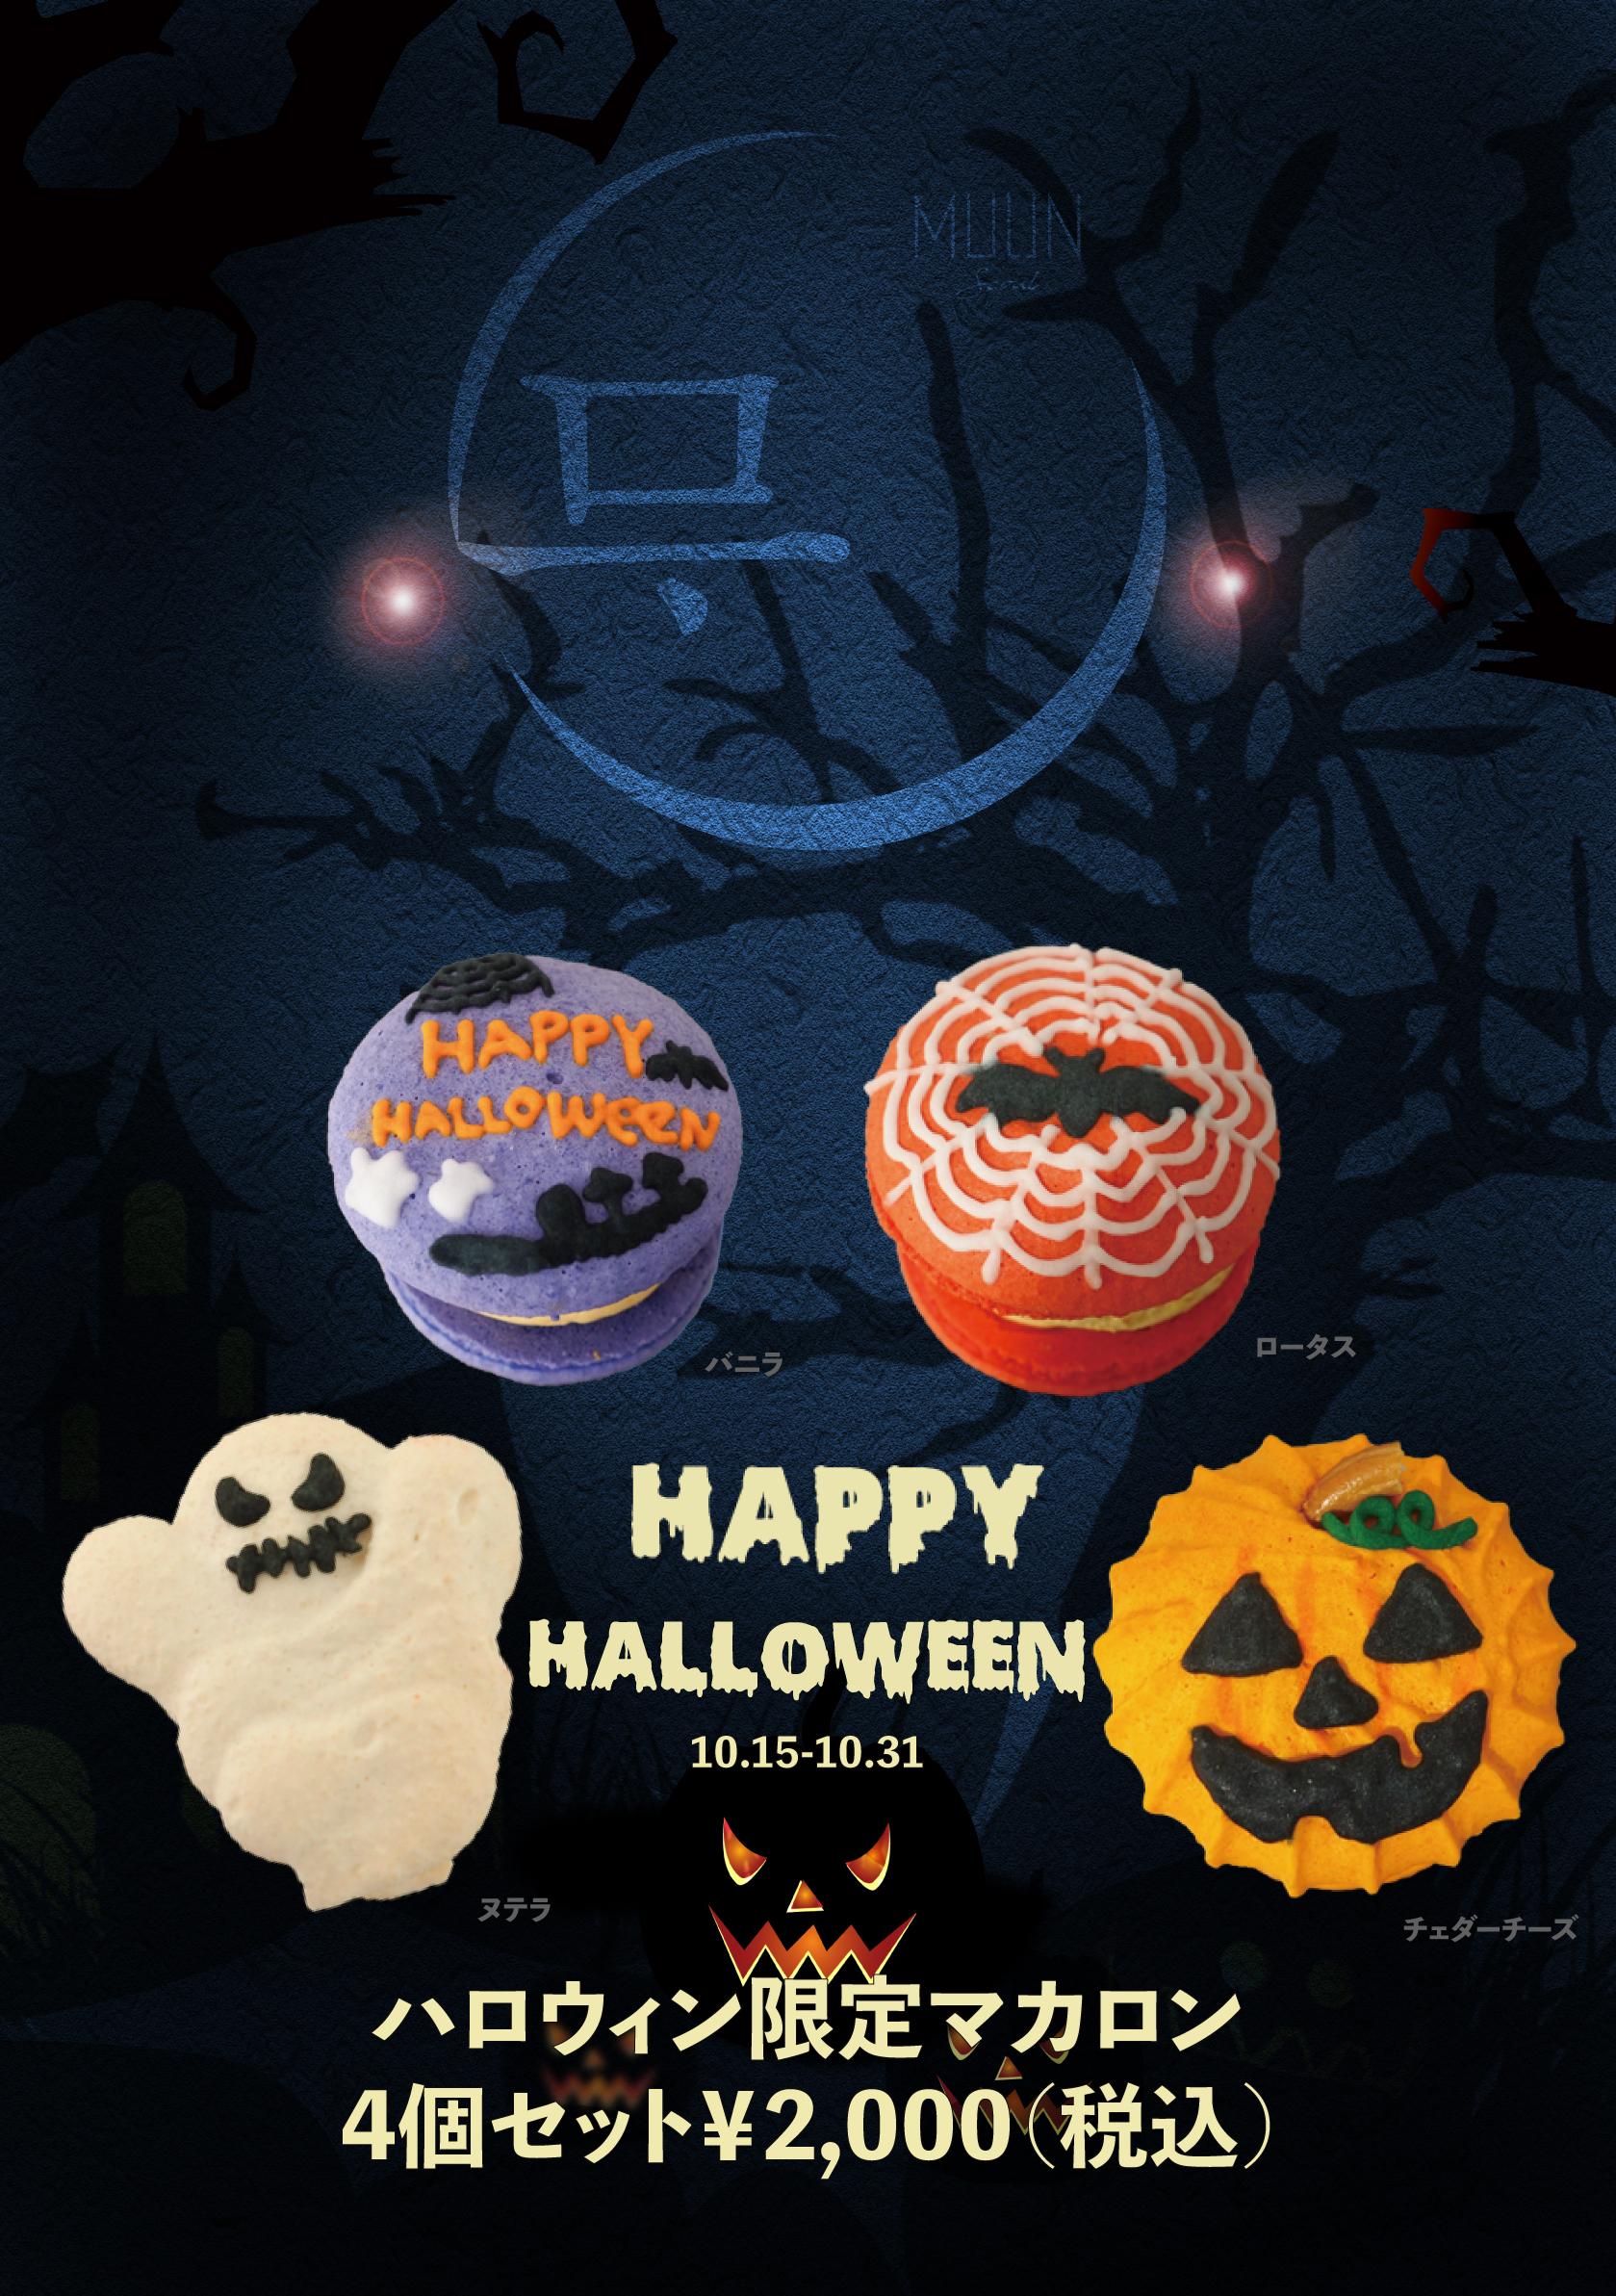 Happy Halloween with MUUN Seoul